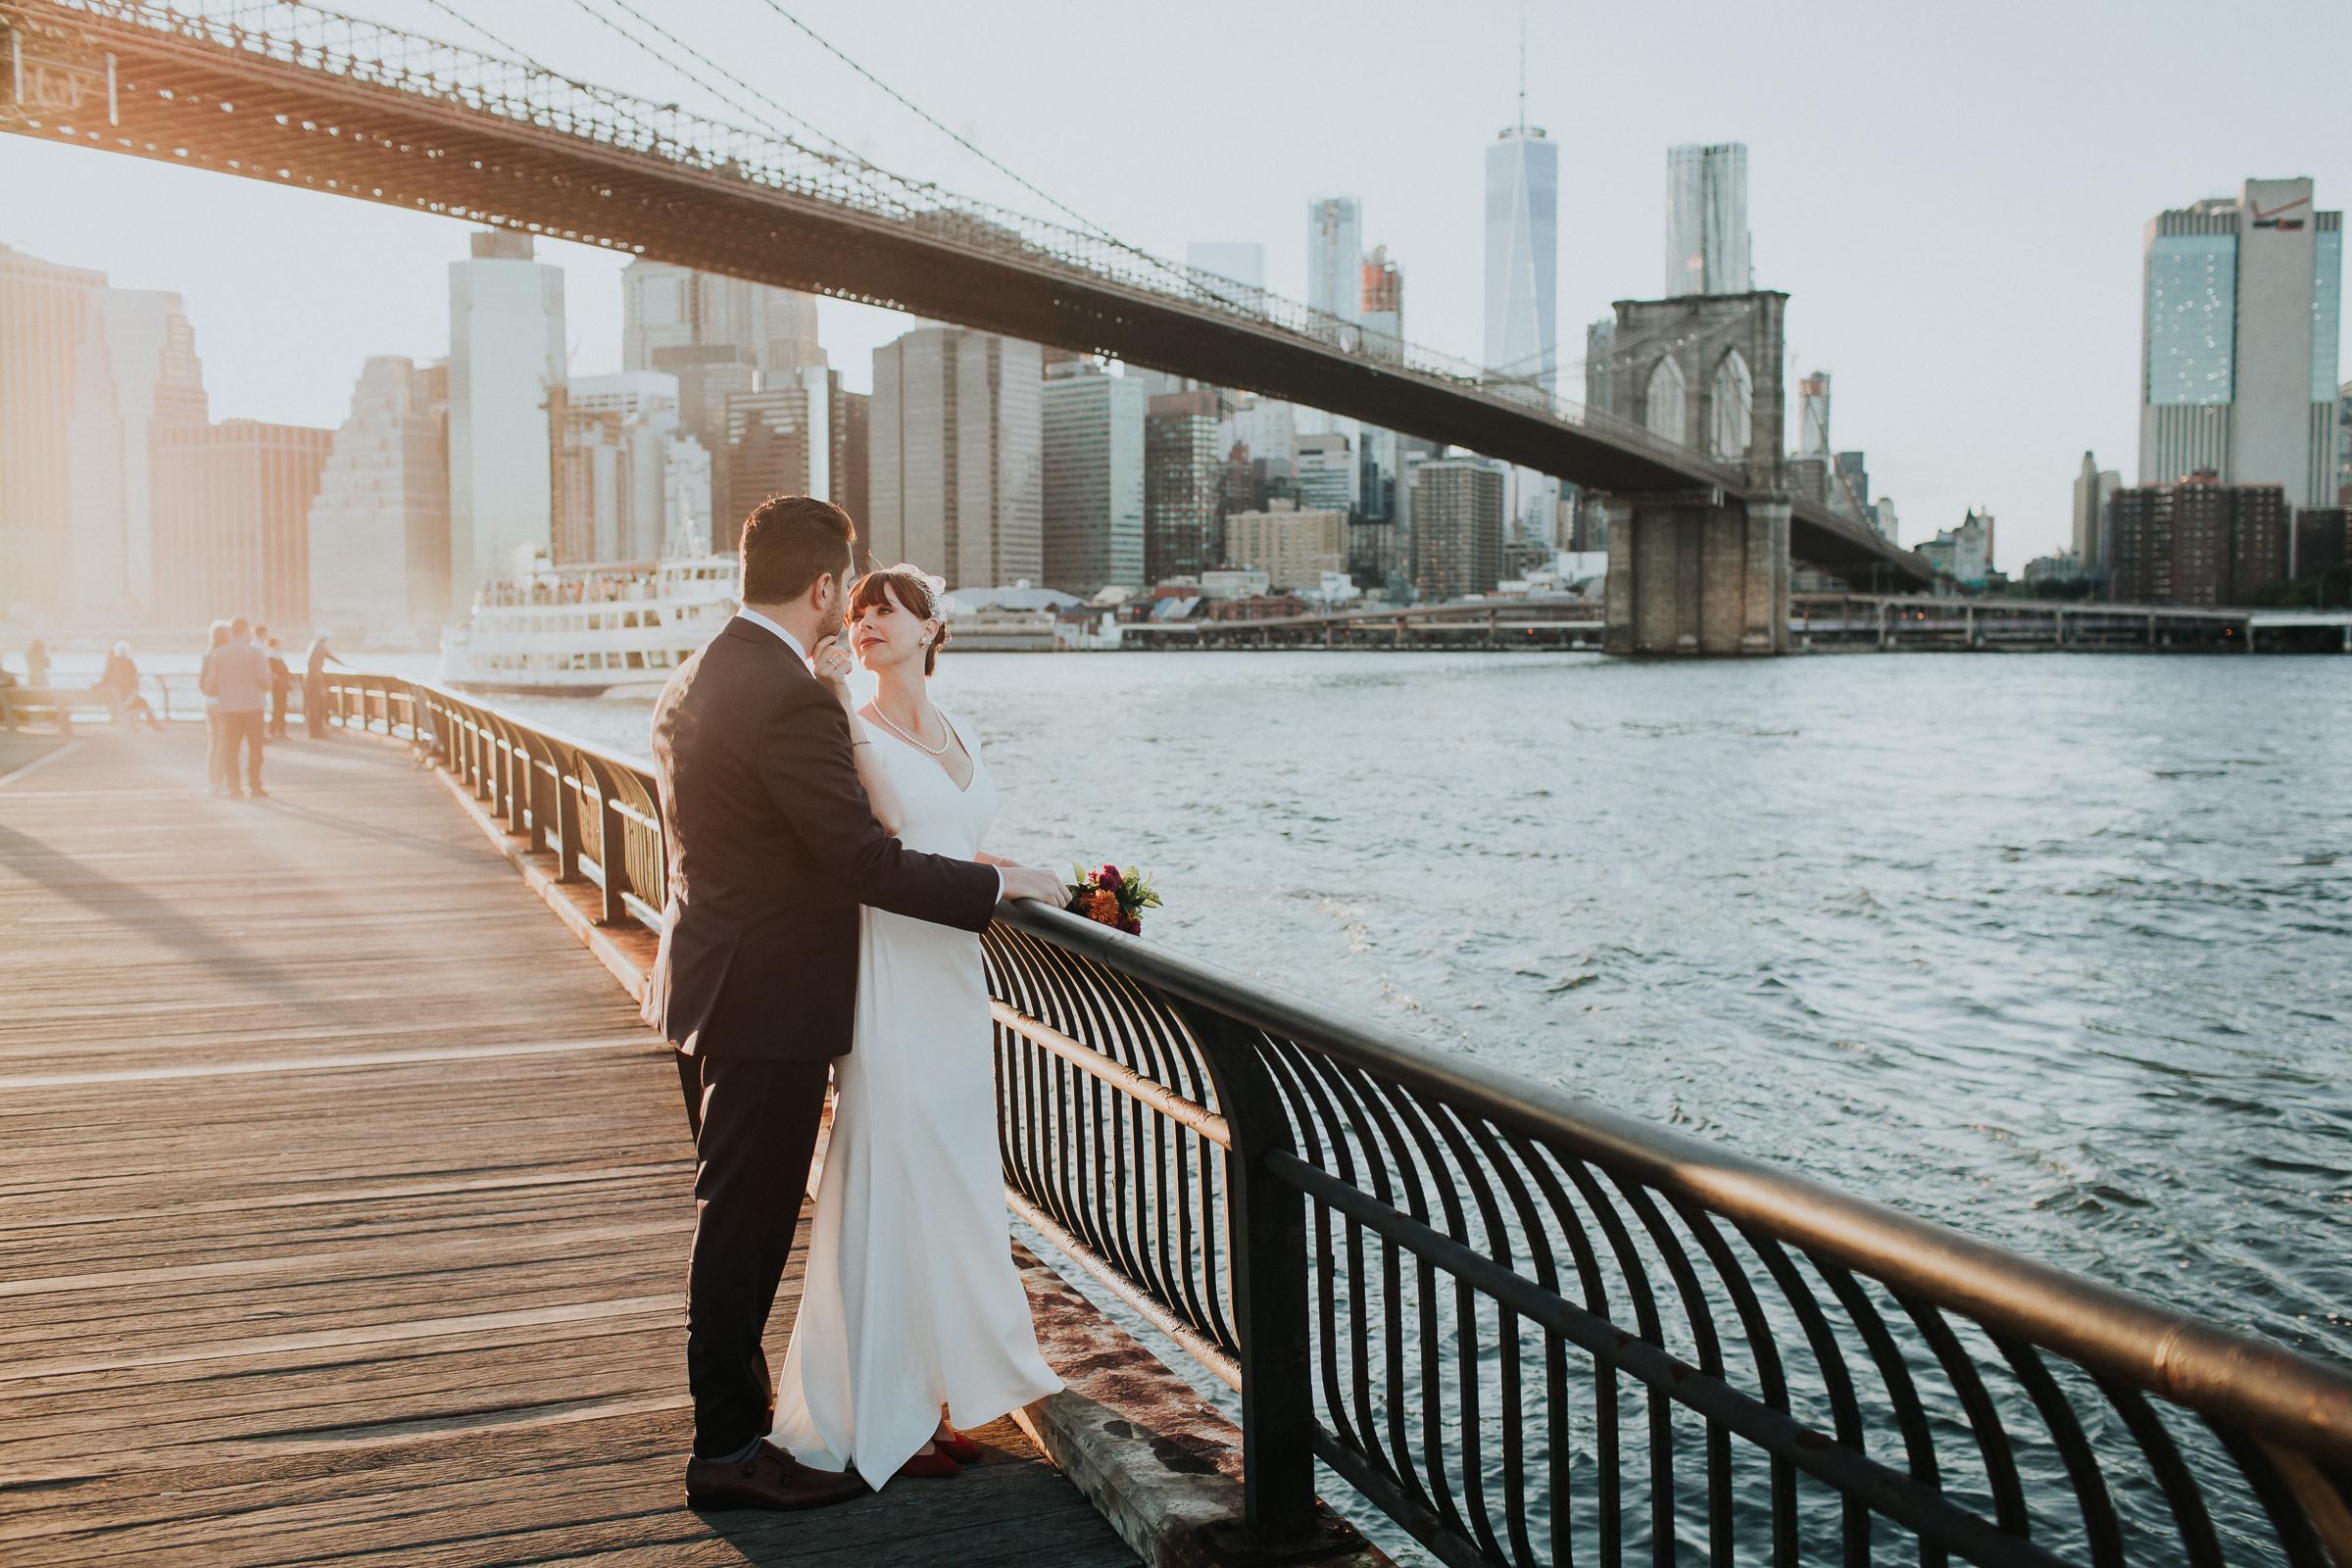 Dumbo-Brooklyn-Bridge-Park-NYC-Elopement-Documentary-Photographer-37.jpg